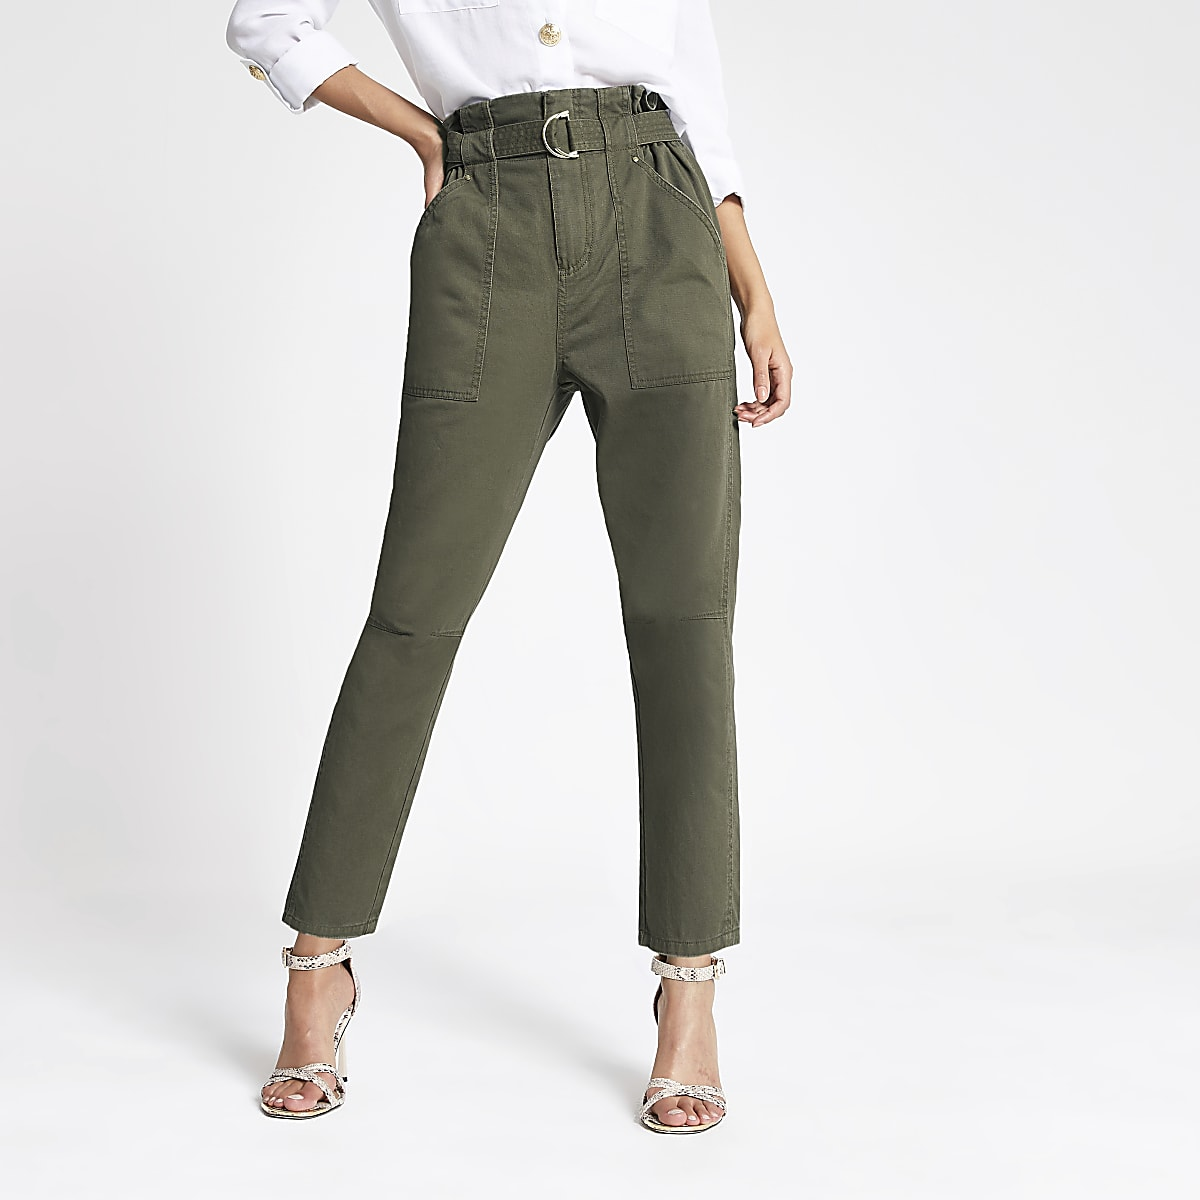 Khaki paperbag jeans